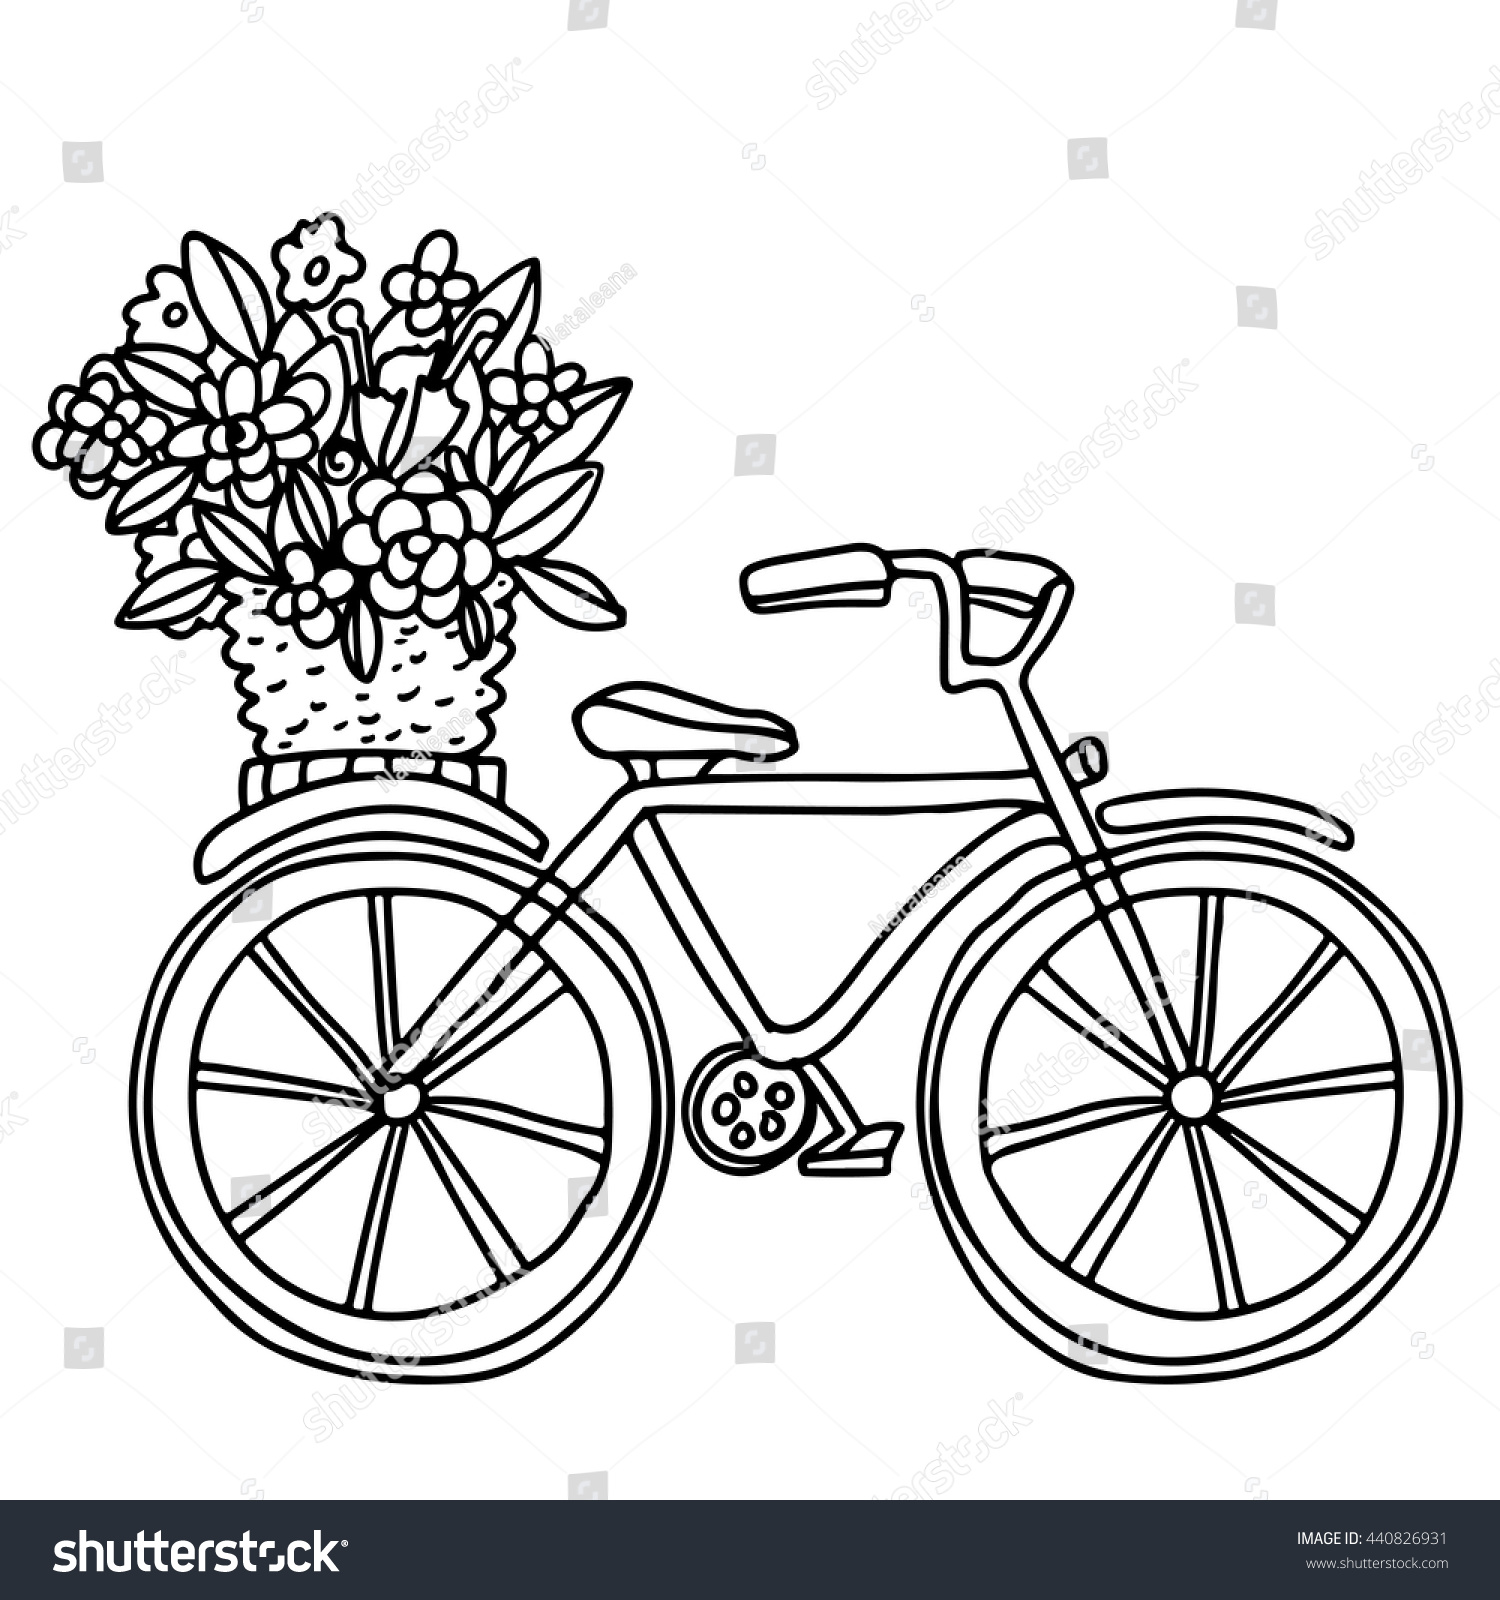 Flower Basket Line Drawing : Bike flowers basket hand drawn black stock vector